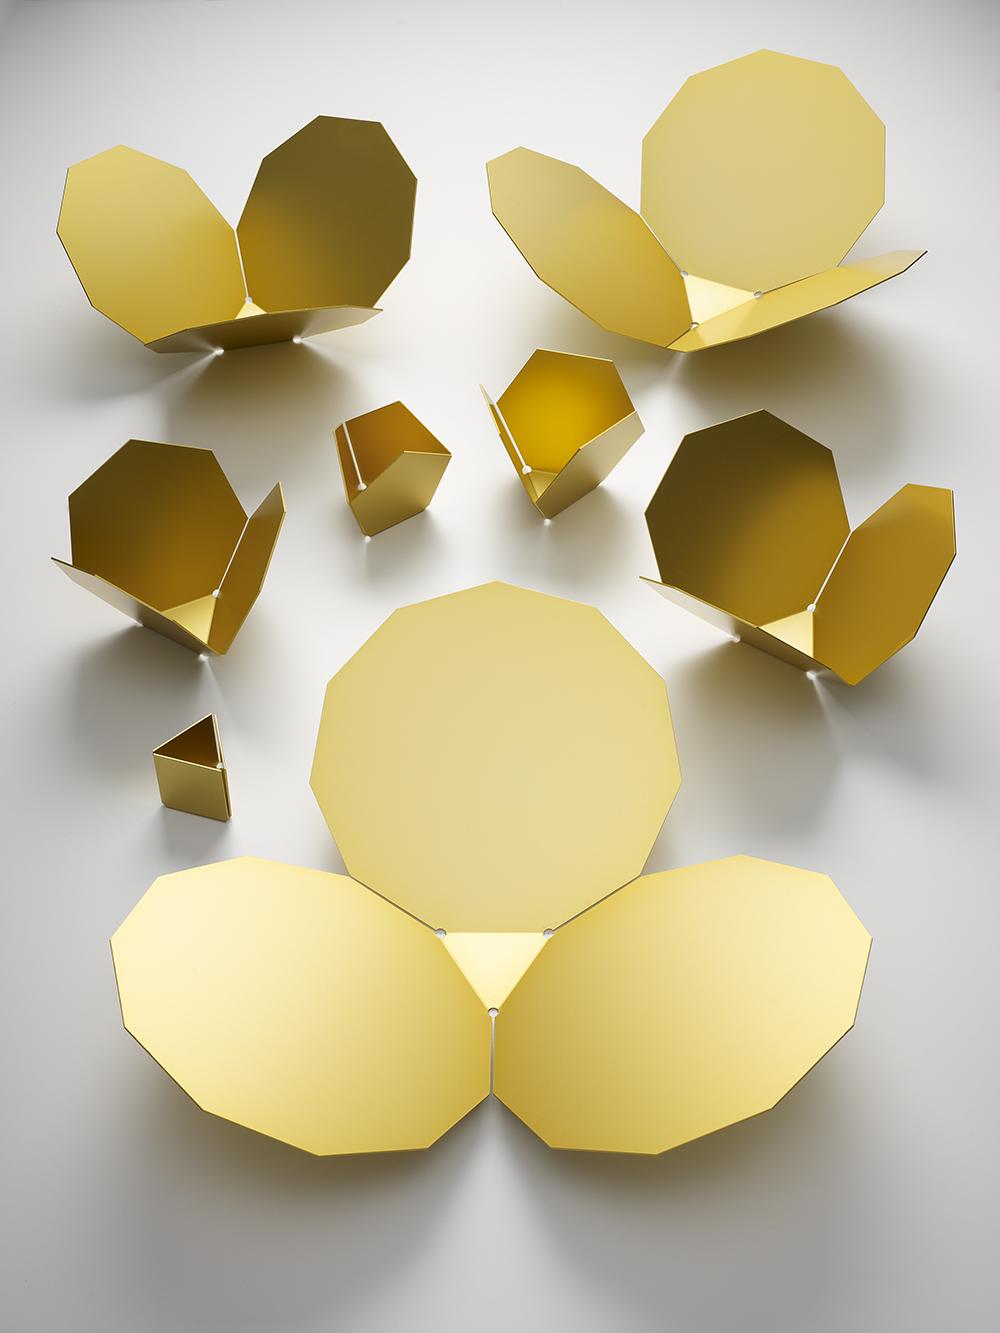 Brooksbank&Collins_Me-Far_Octo_Light Gold_2_1000pix